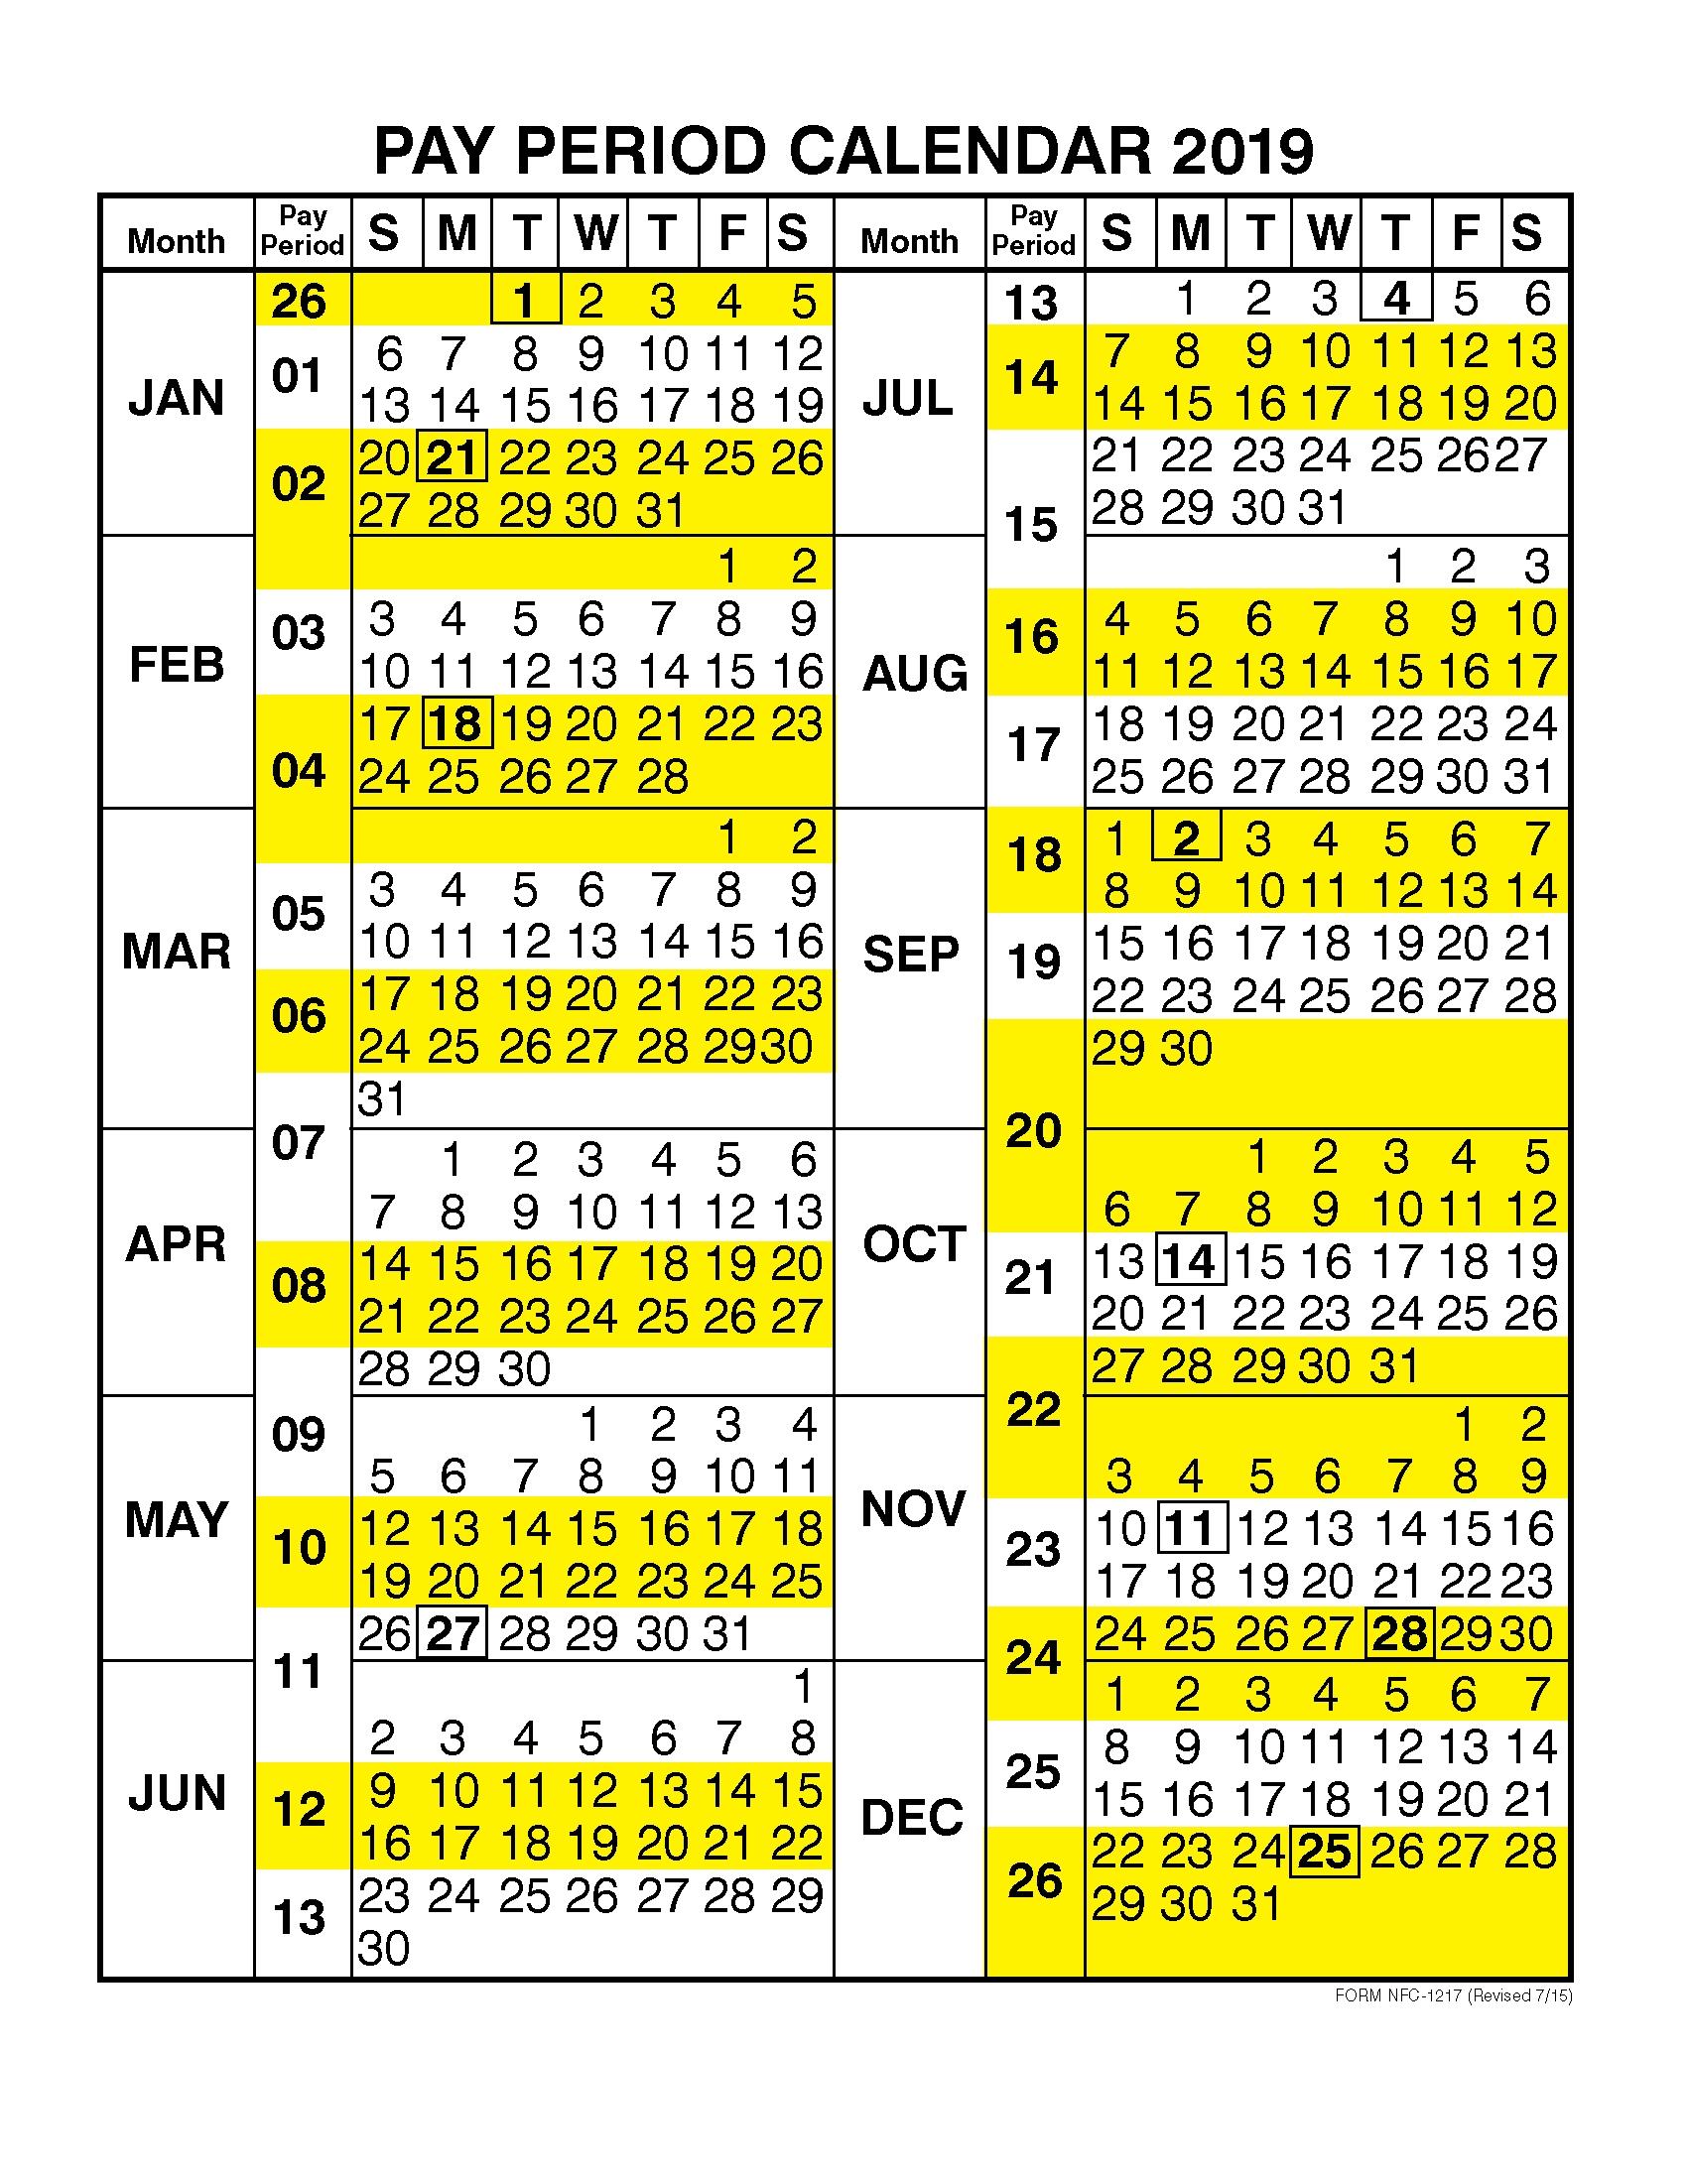 Pay Period Calendar 2019Calendar Year | Free Printable for 2020 Federal Pay Period Calendar Printable